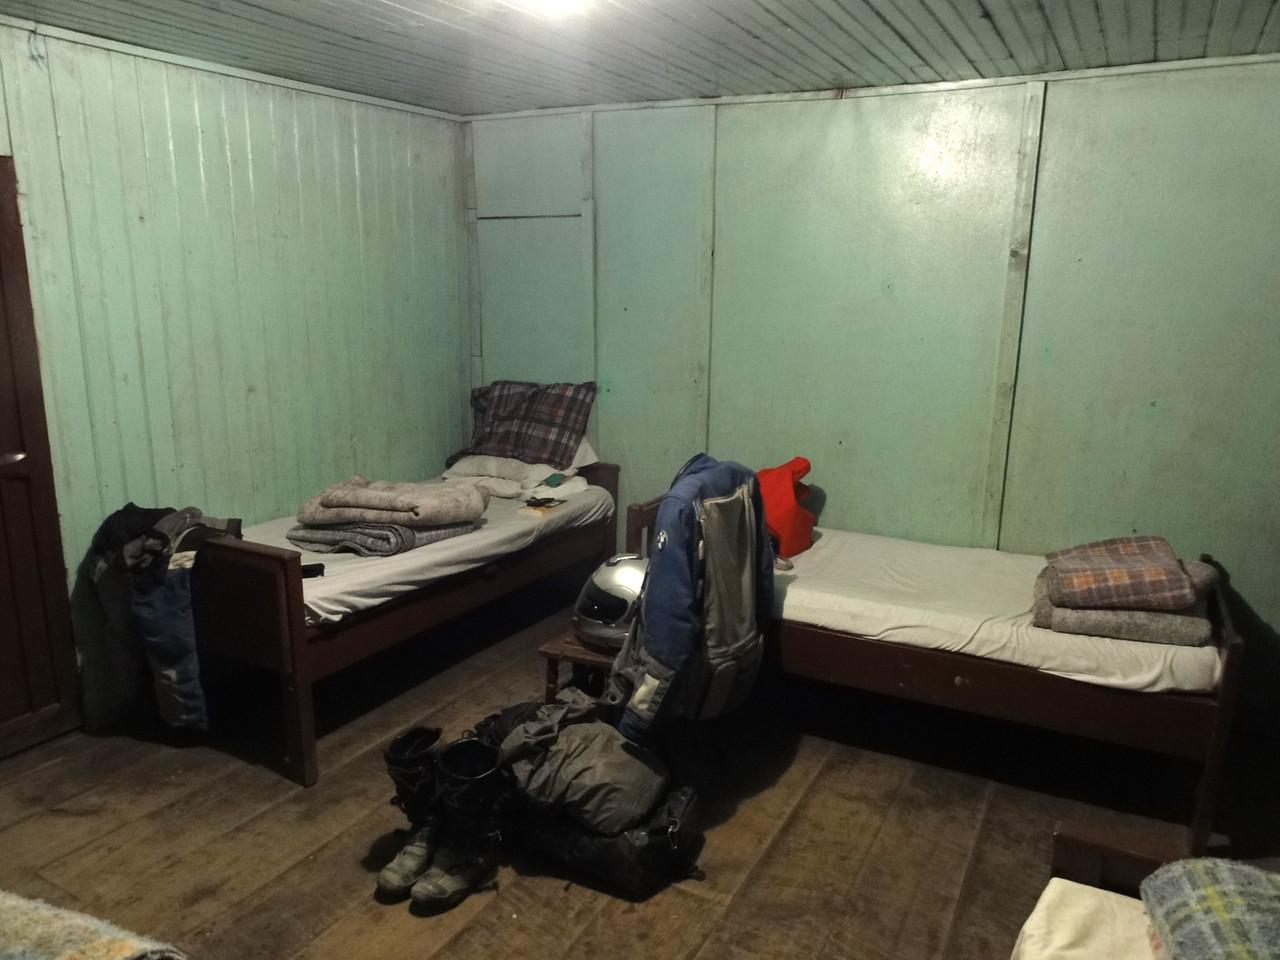 Hostel/Hospedaje La Paz,  Todos Santos Cuchumatan.  Guatemala